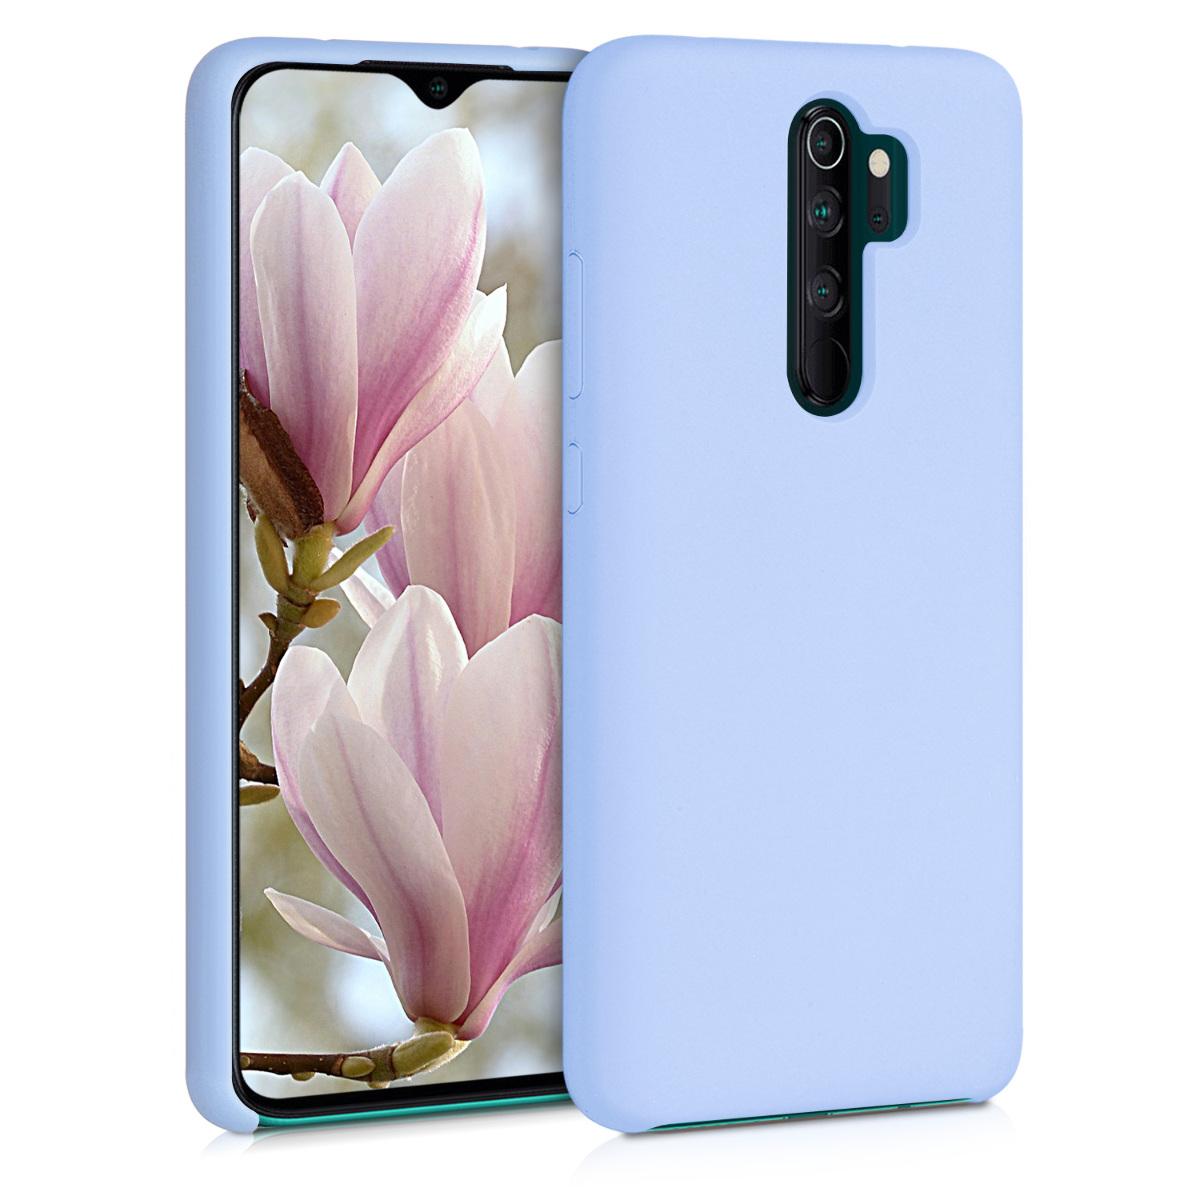 KW Θήκη Σιλικόνης Xiaomi Redmi Note 8 Pro - Soft Flexible Rubber - Light Blue Matte (50248.58)